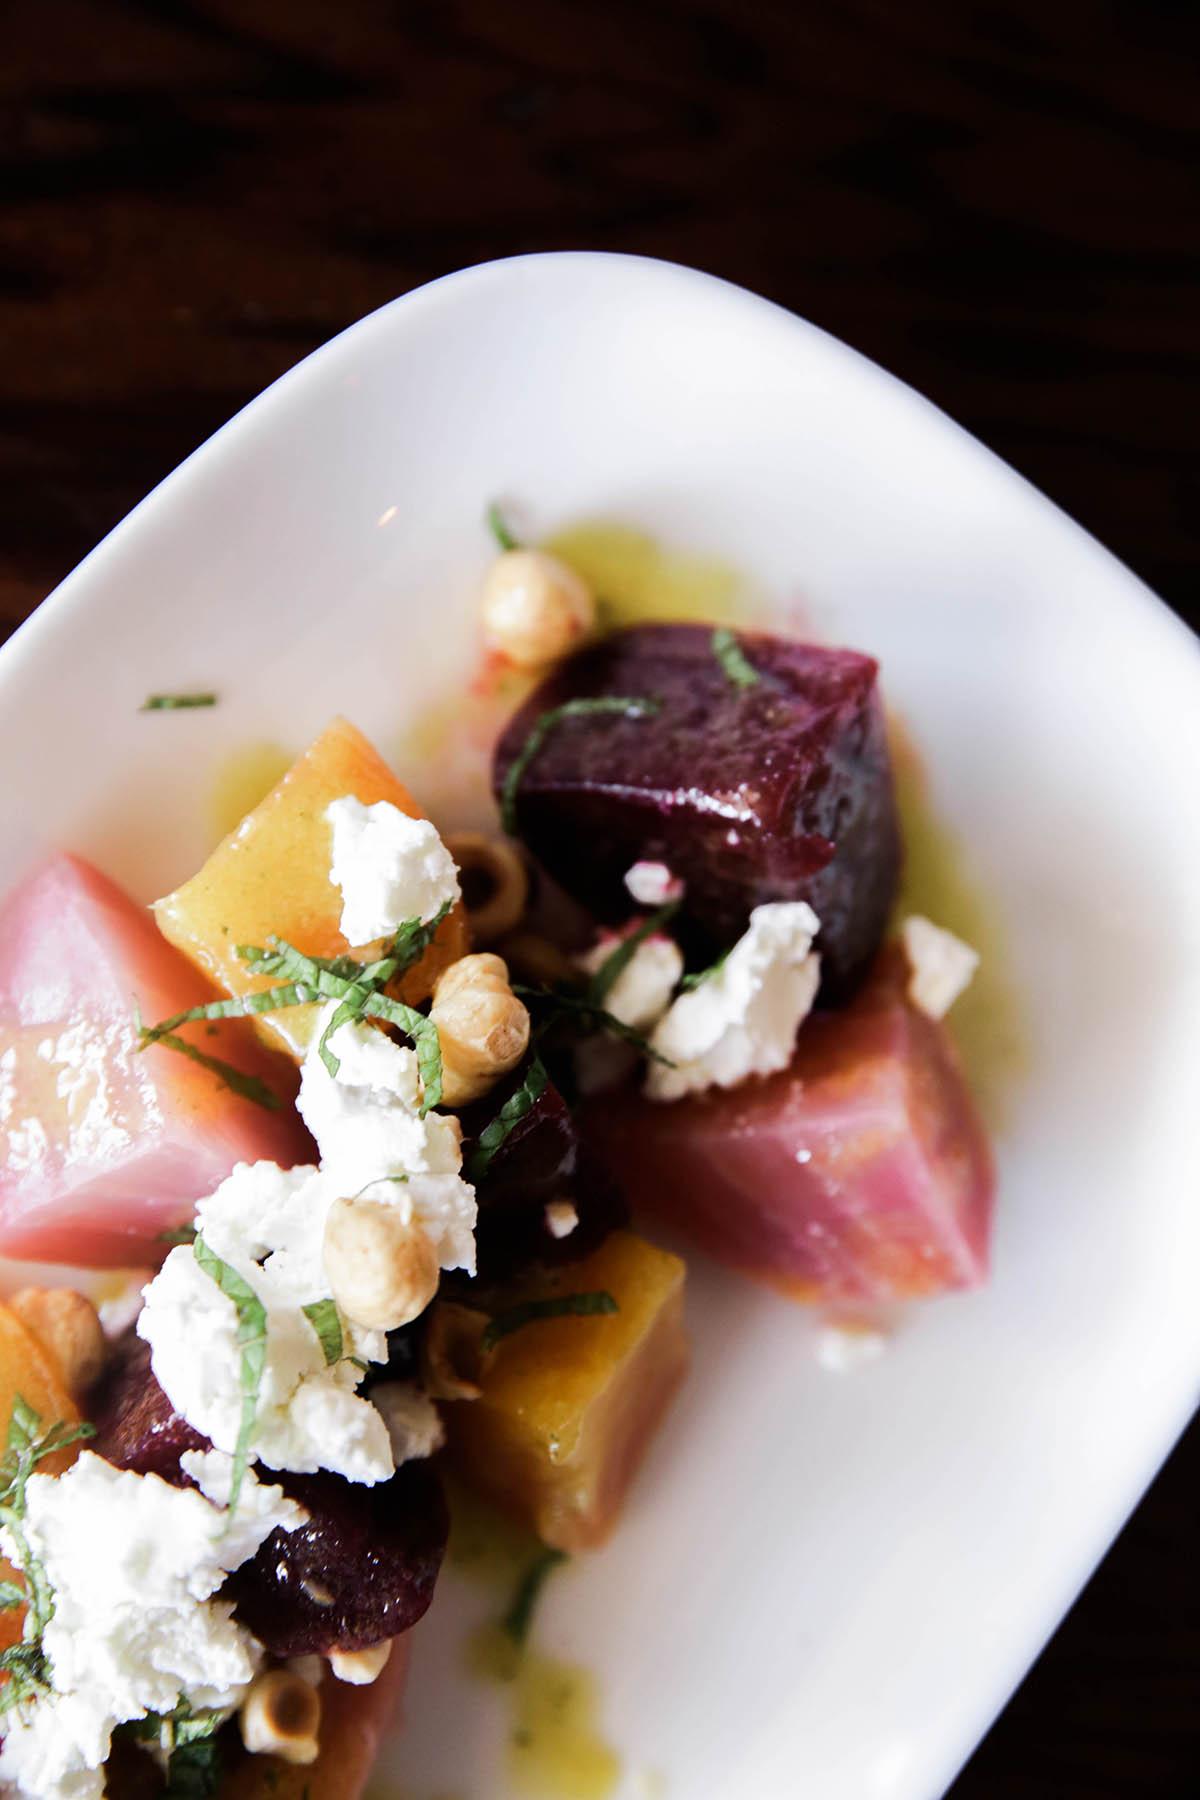 beet salad at Guerneville restaurants boon eat + drink